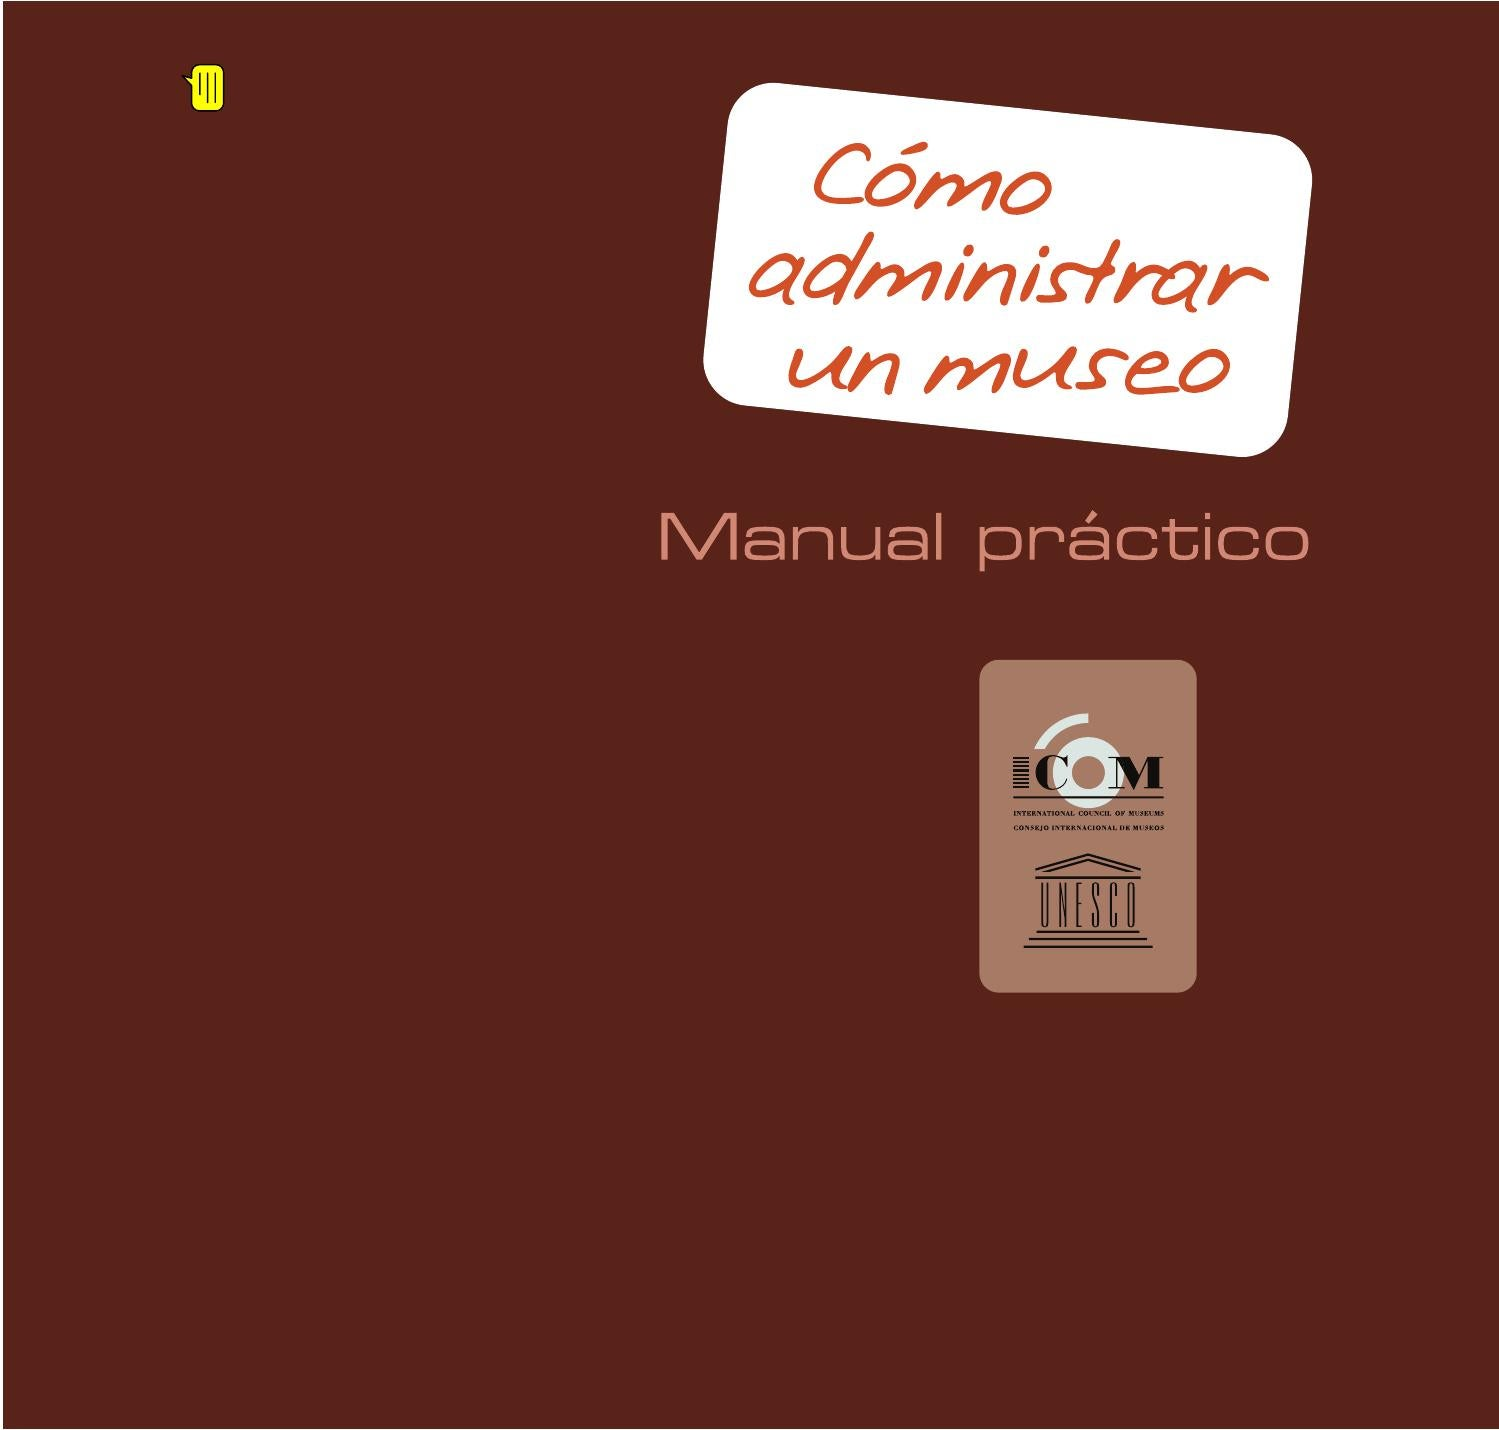 66b839a2da COMO ADMINISTRAR UN MUSEO by Ale Giorgga - issuu